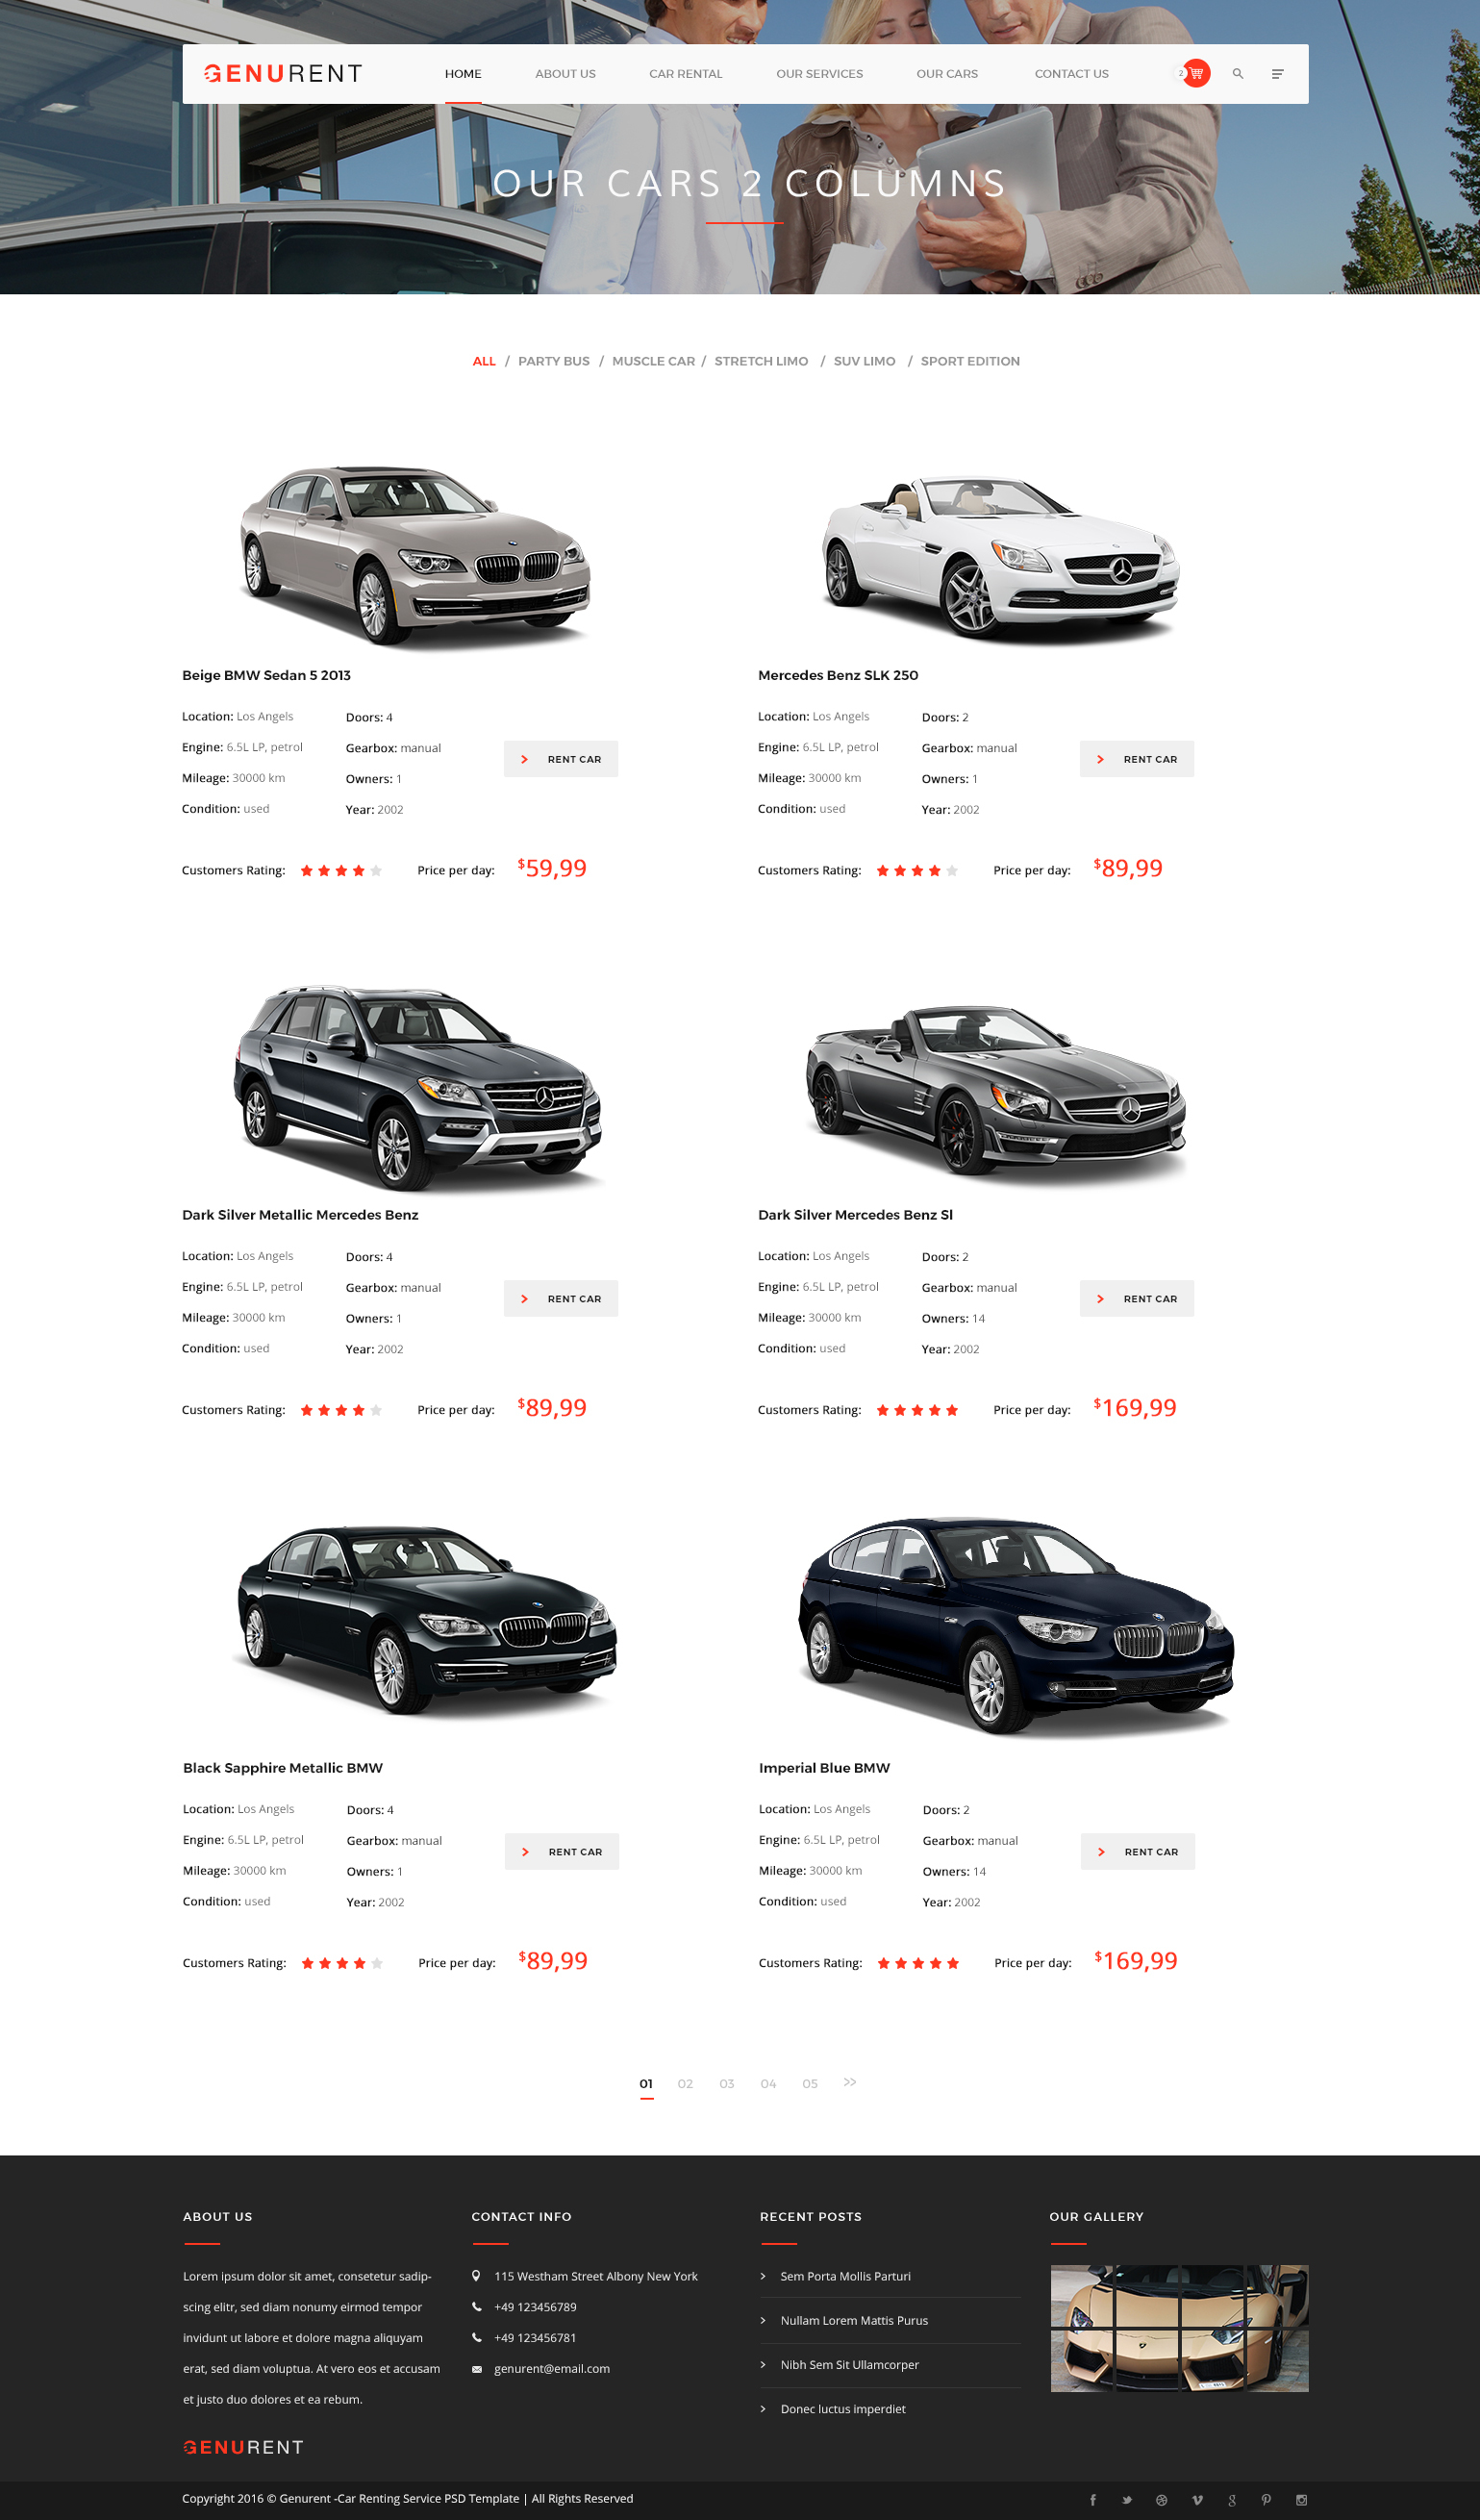 Genurent car rental service psd template